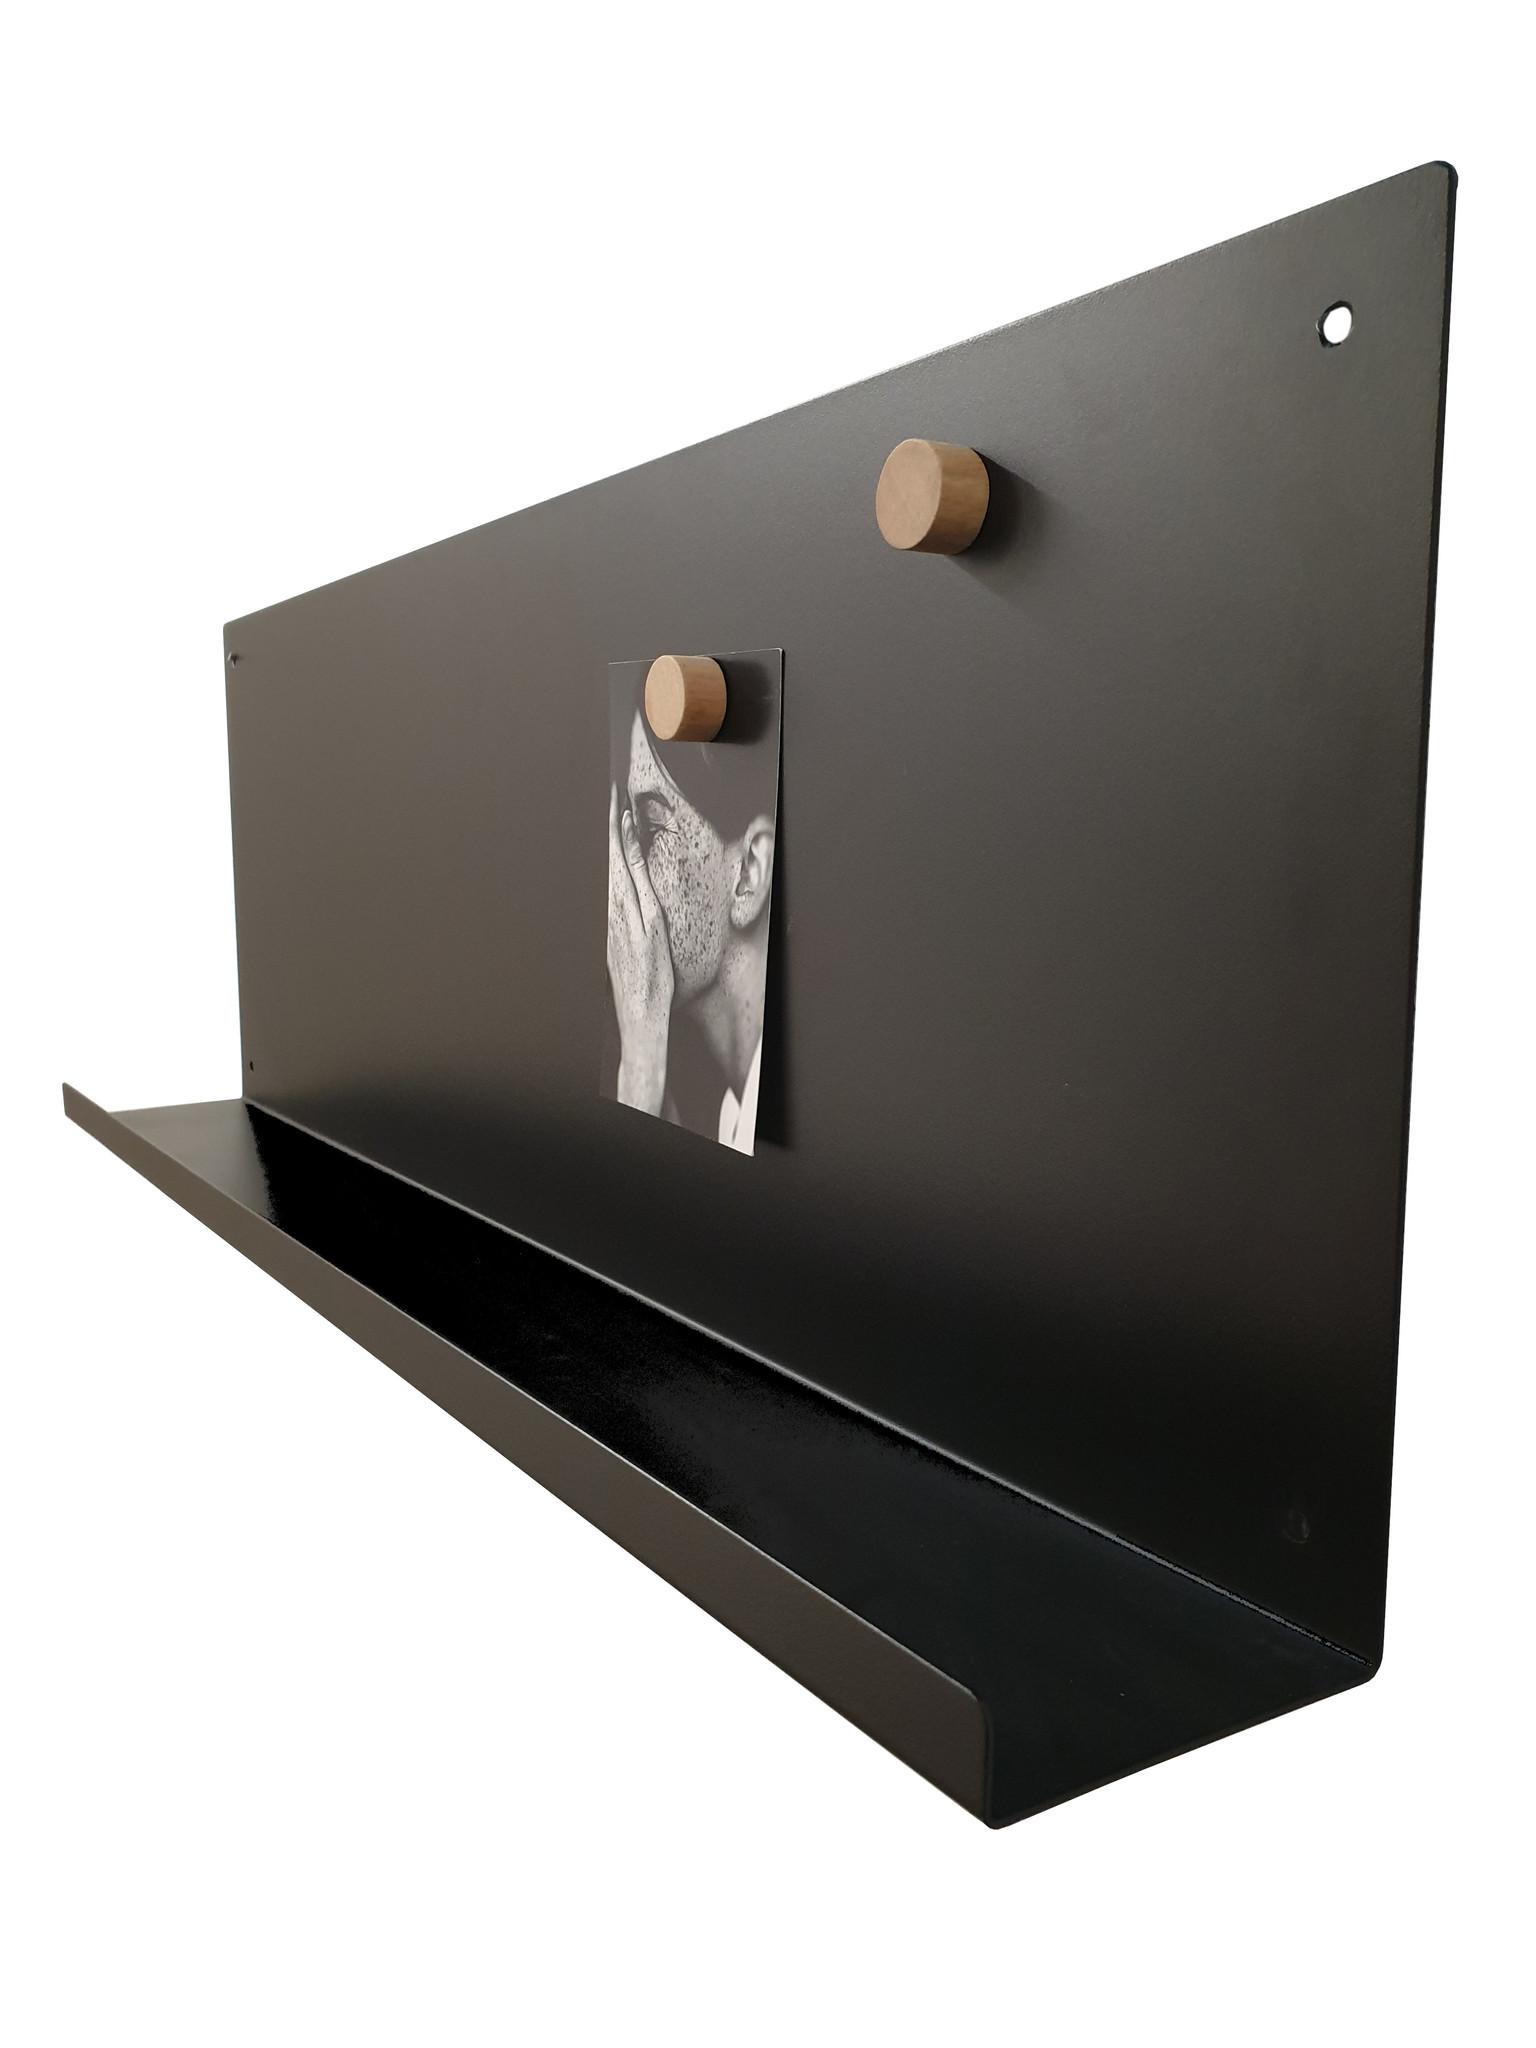 Stoer Metaal wall shelf Rug, black or white